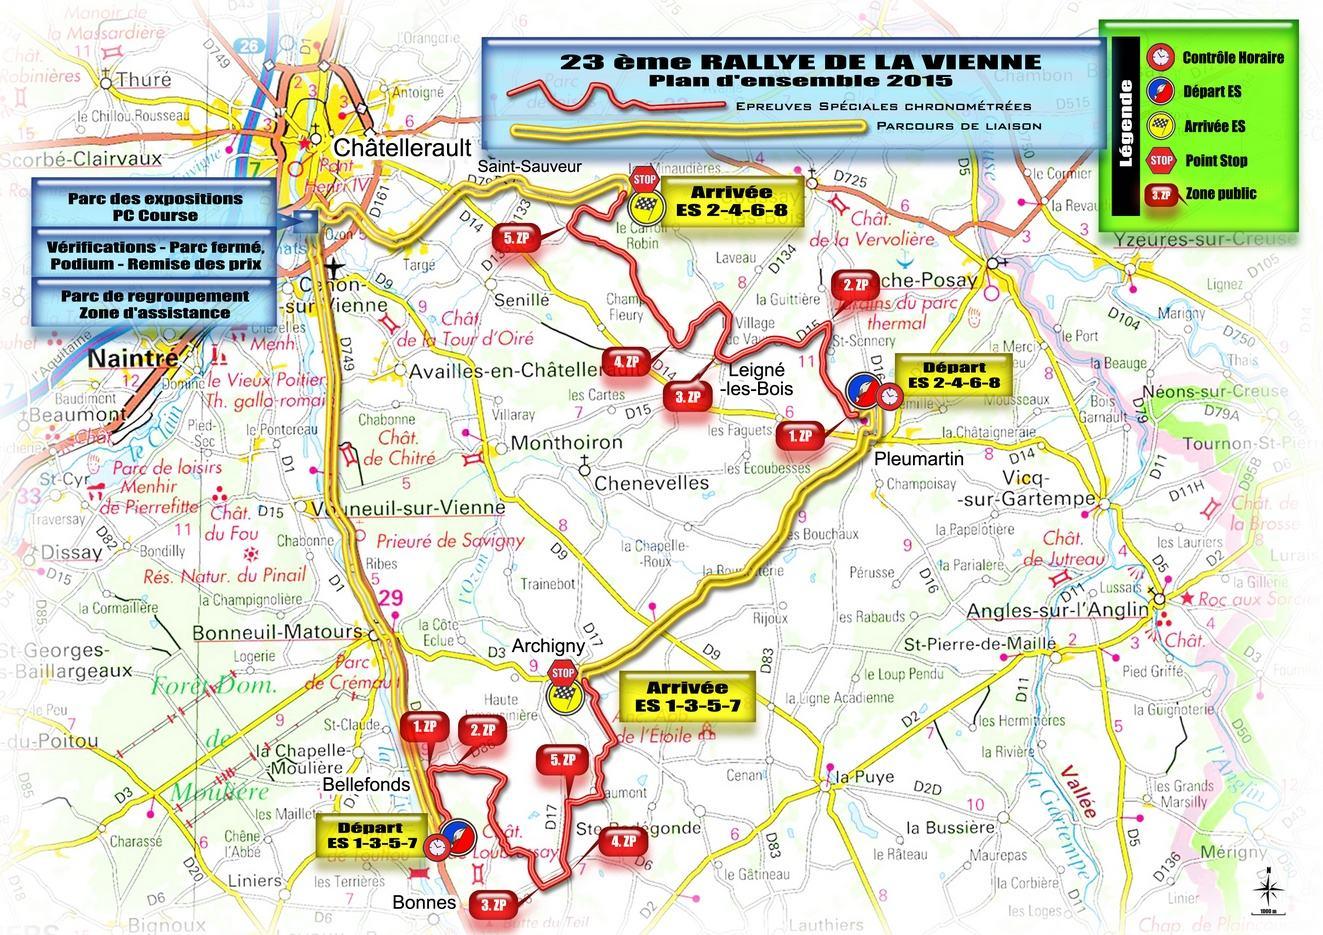 Rallye de la vienne 2015 for Habitat de la vienne chatellerault